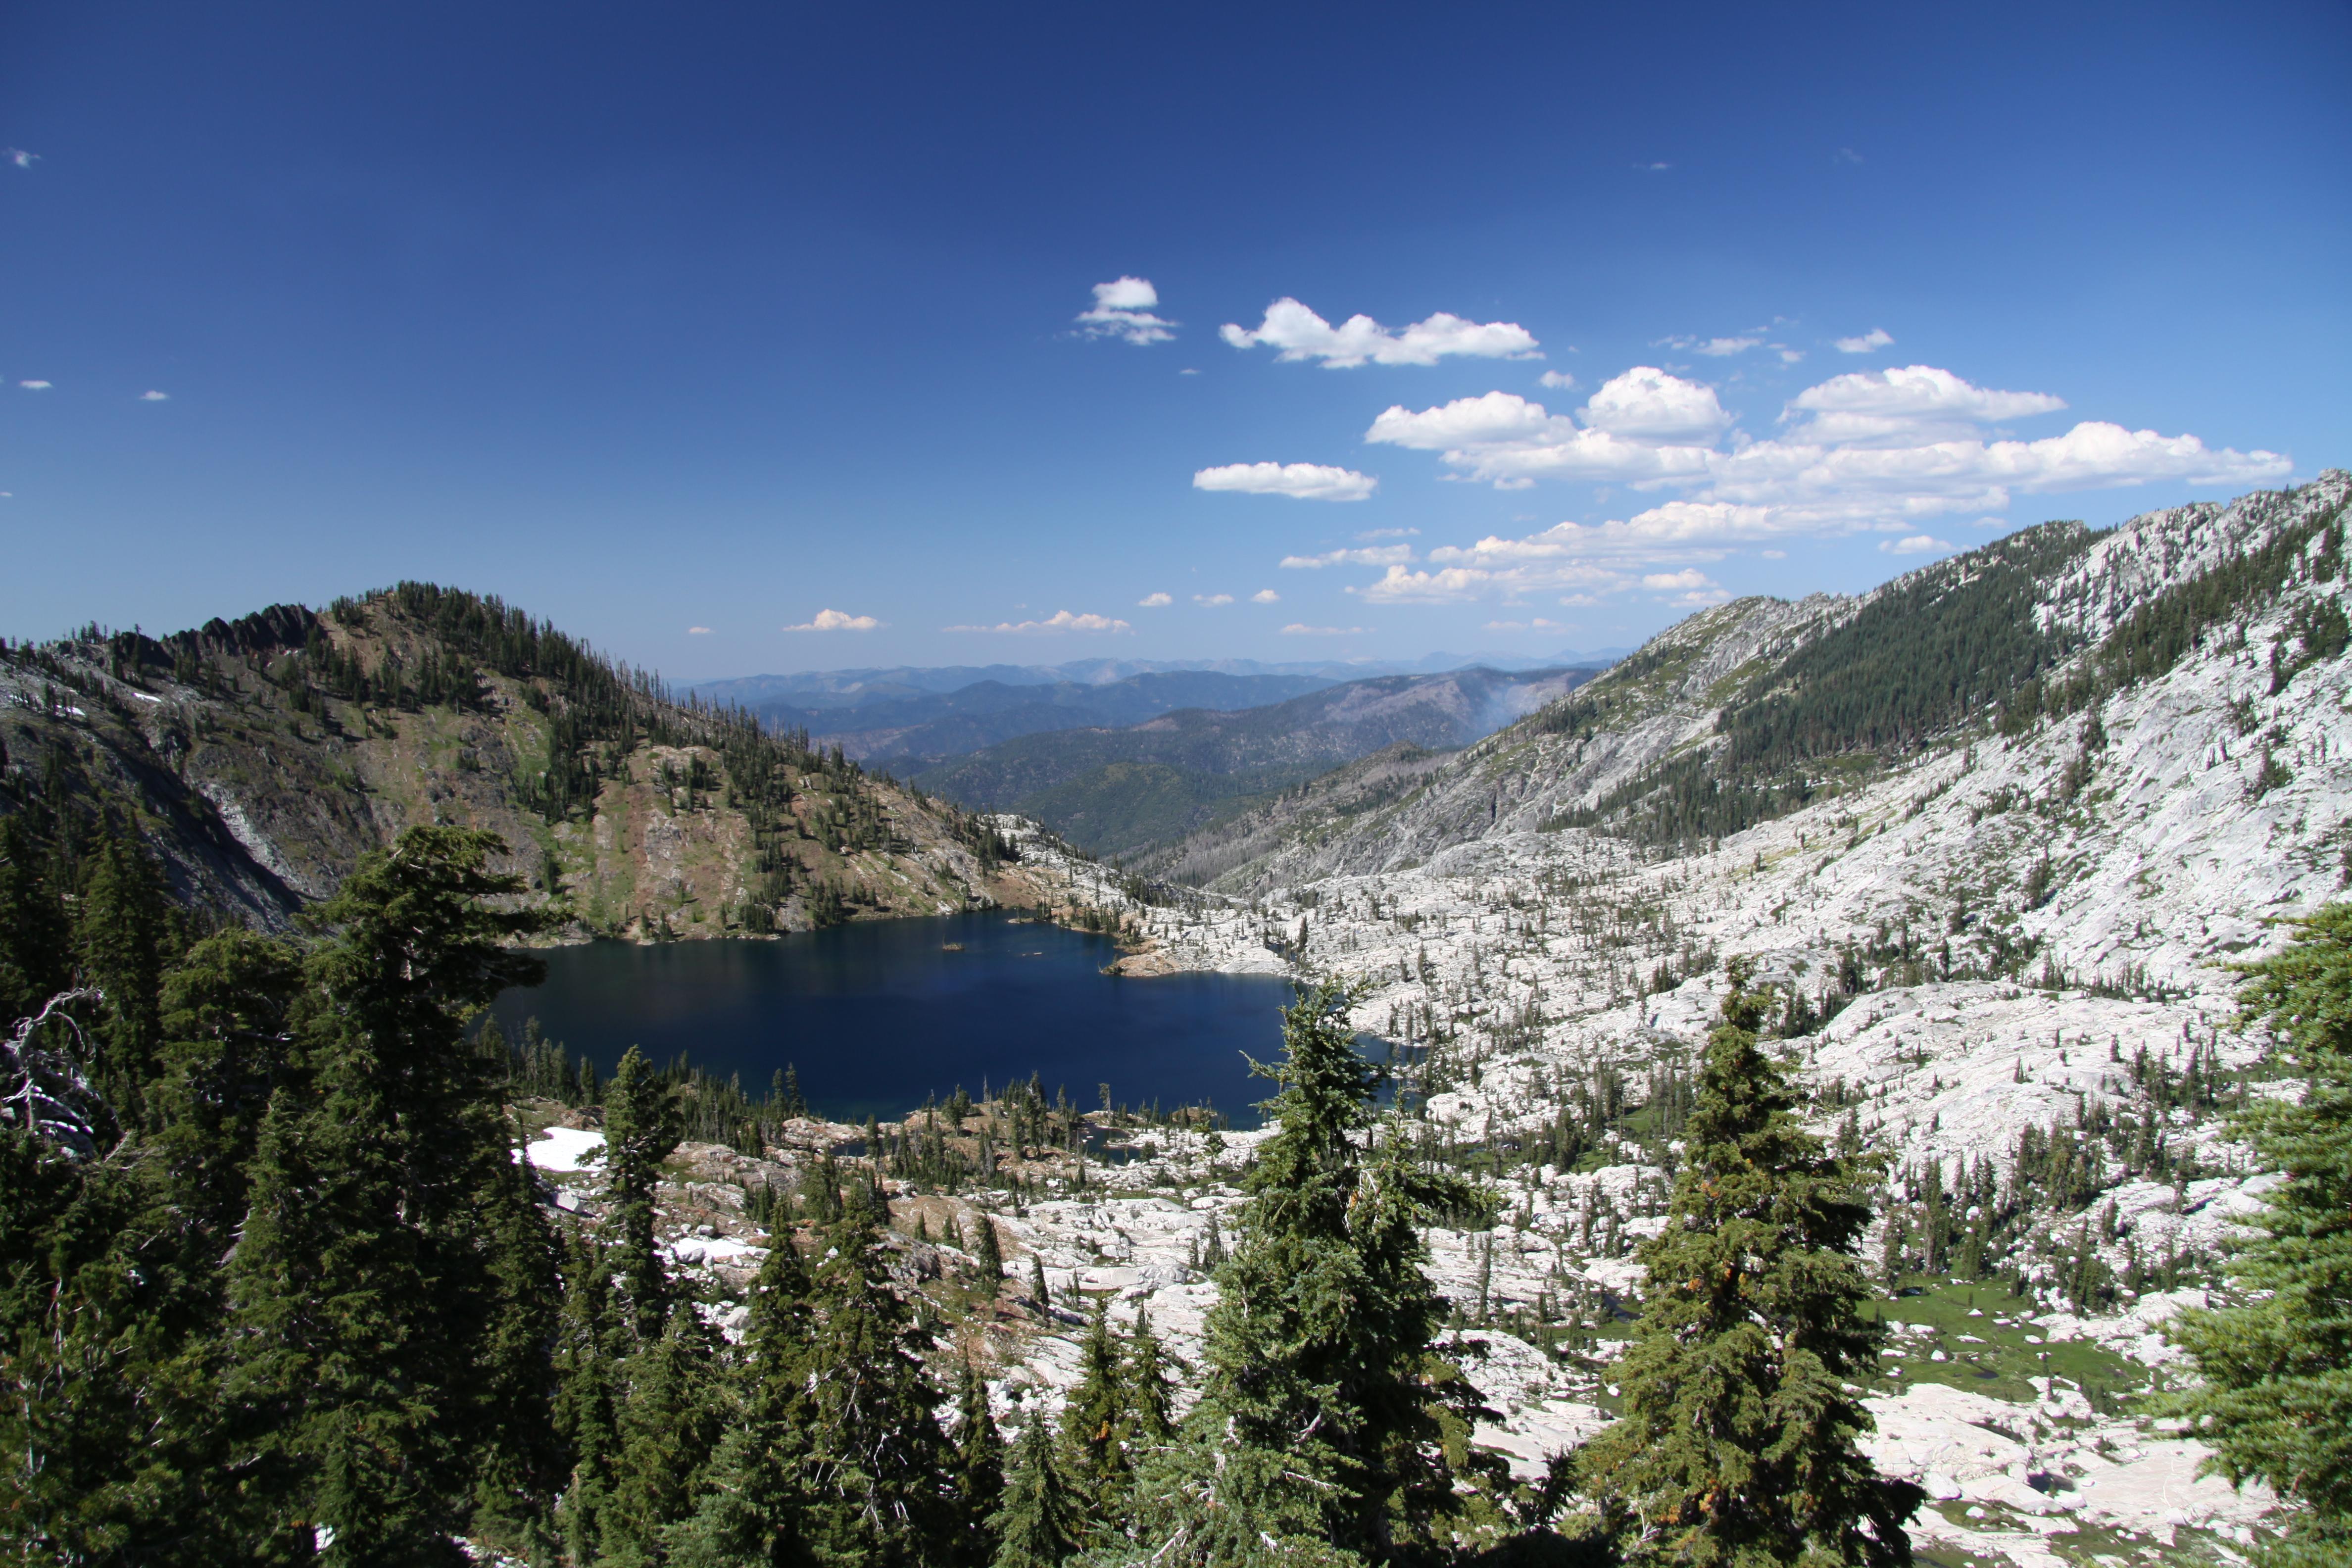 Northern california dating